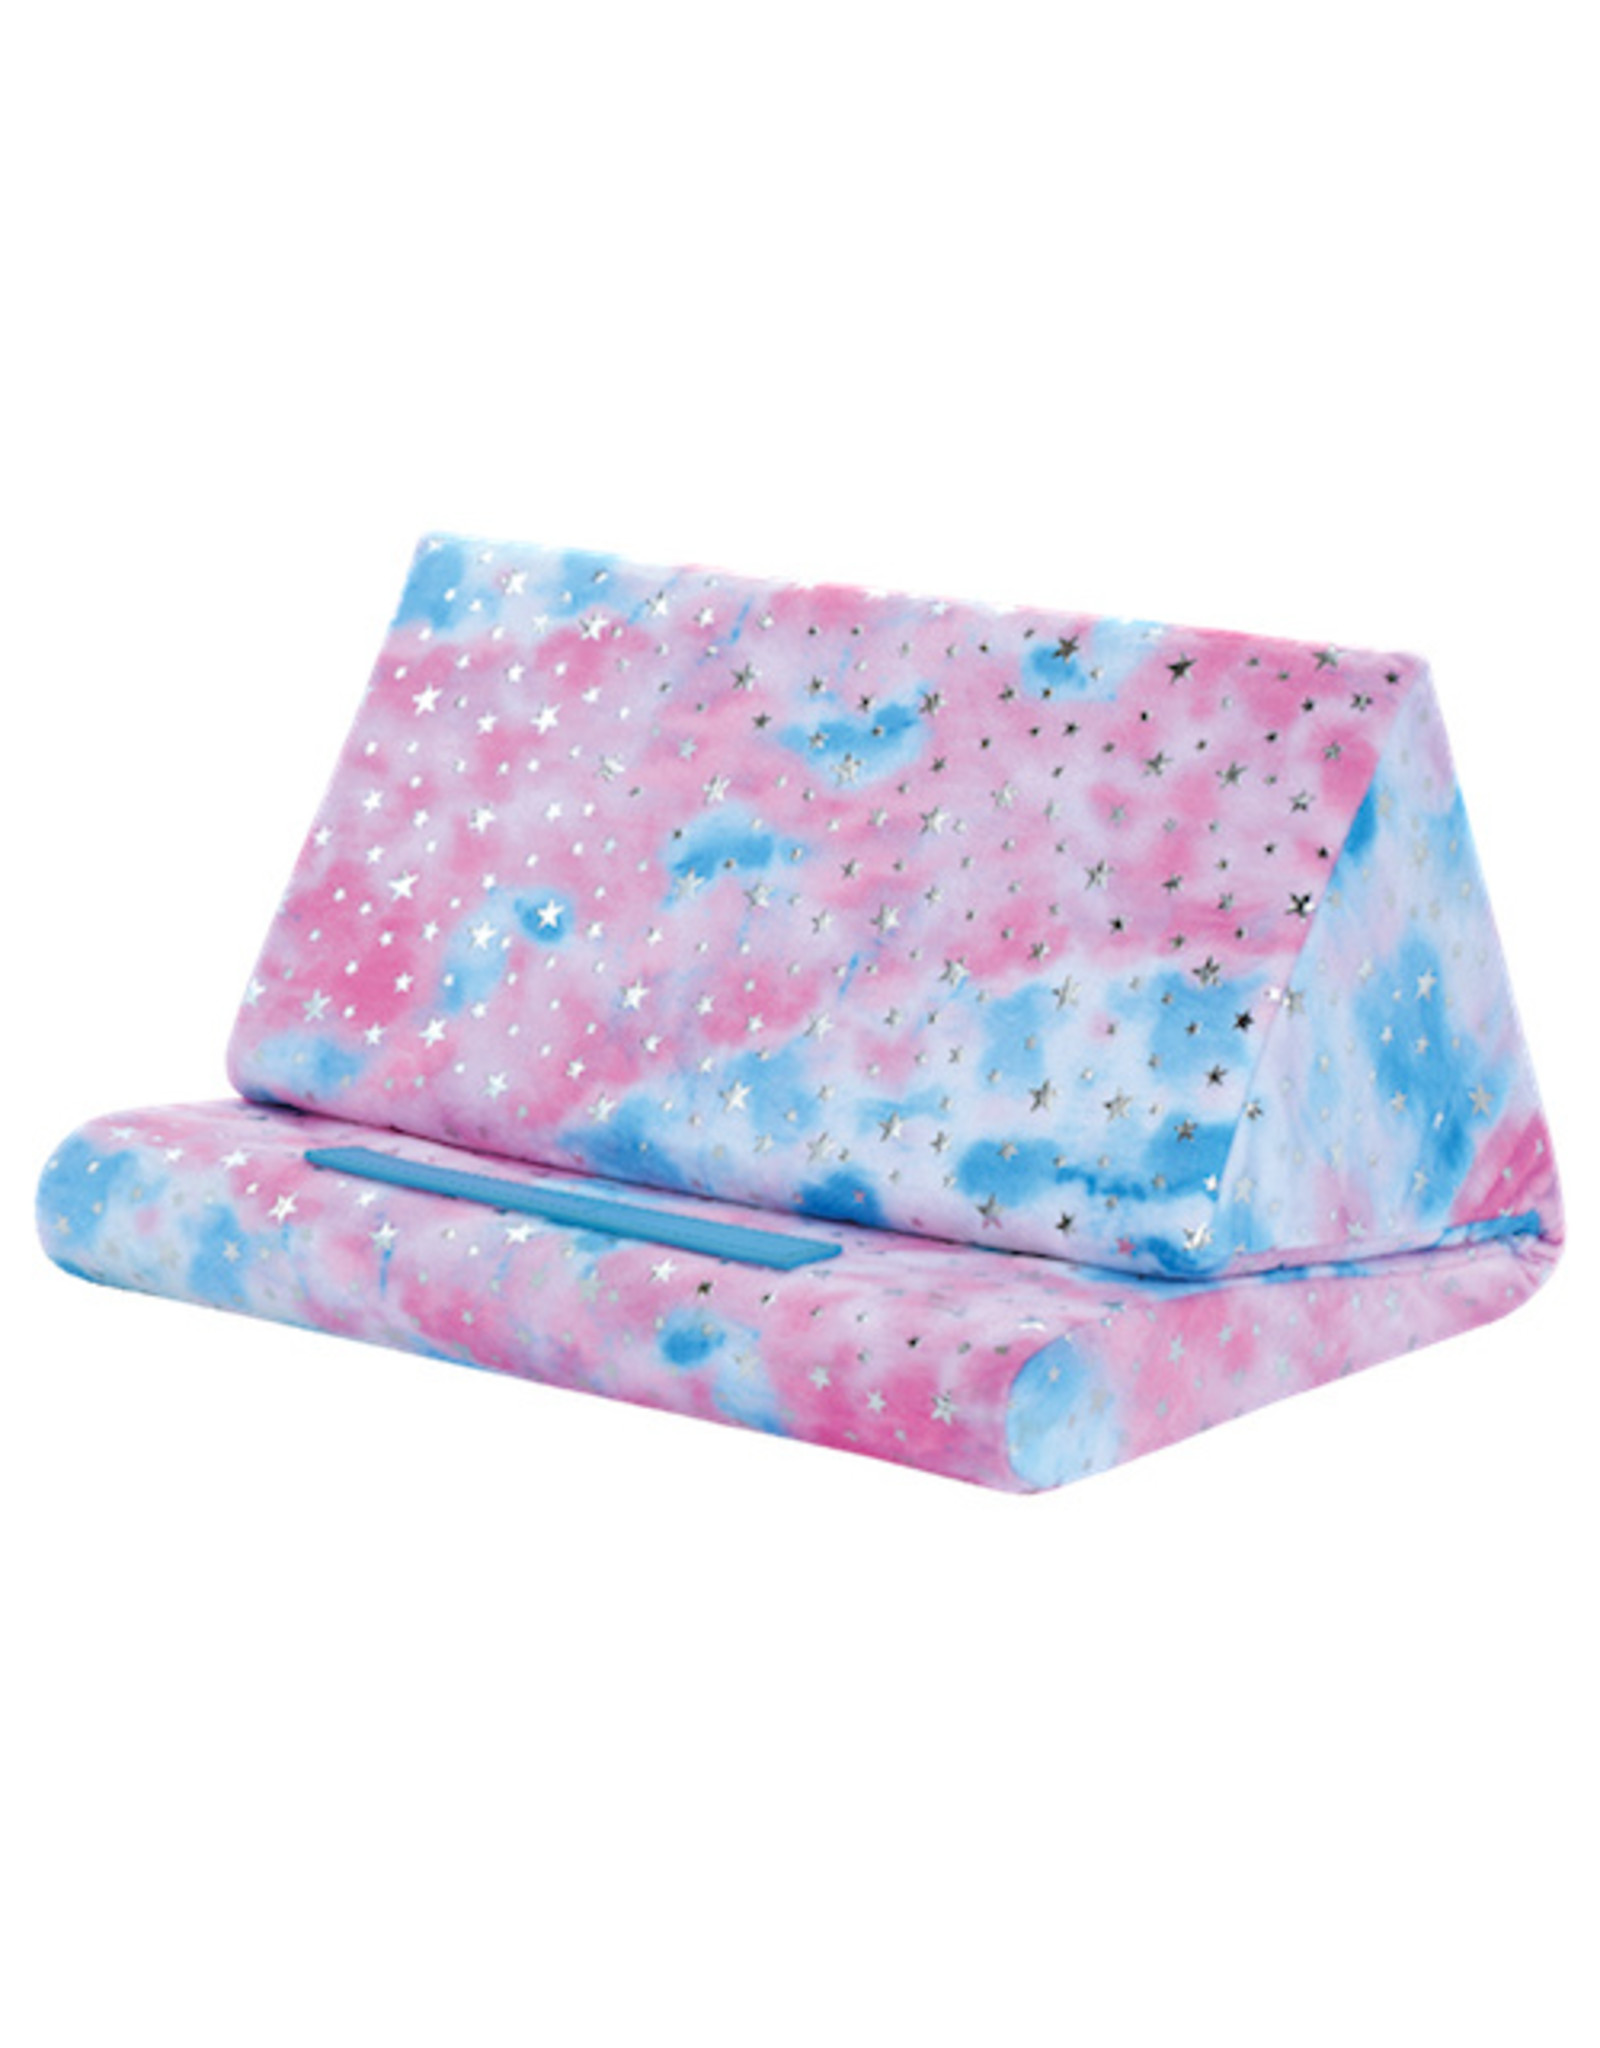 Iscream Tablet Pillow